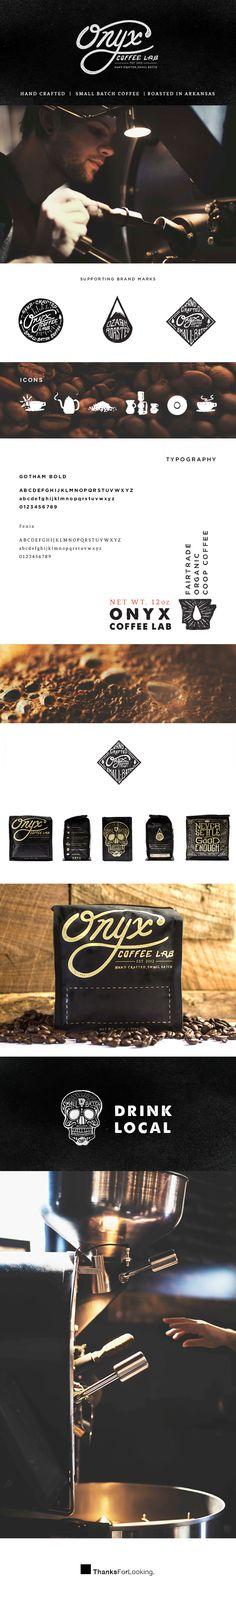 Onyx Coffee Lab - Branding by Jeremy Teff, via Behance